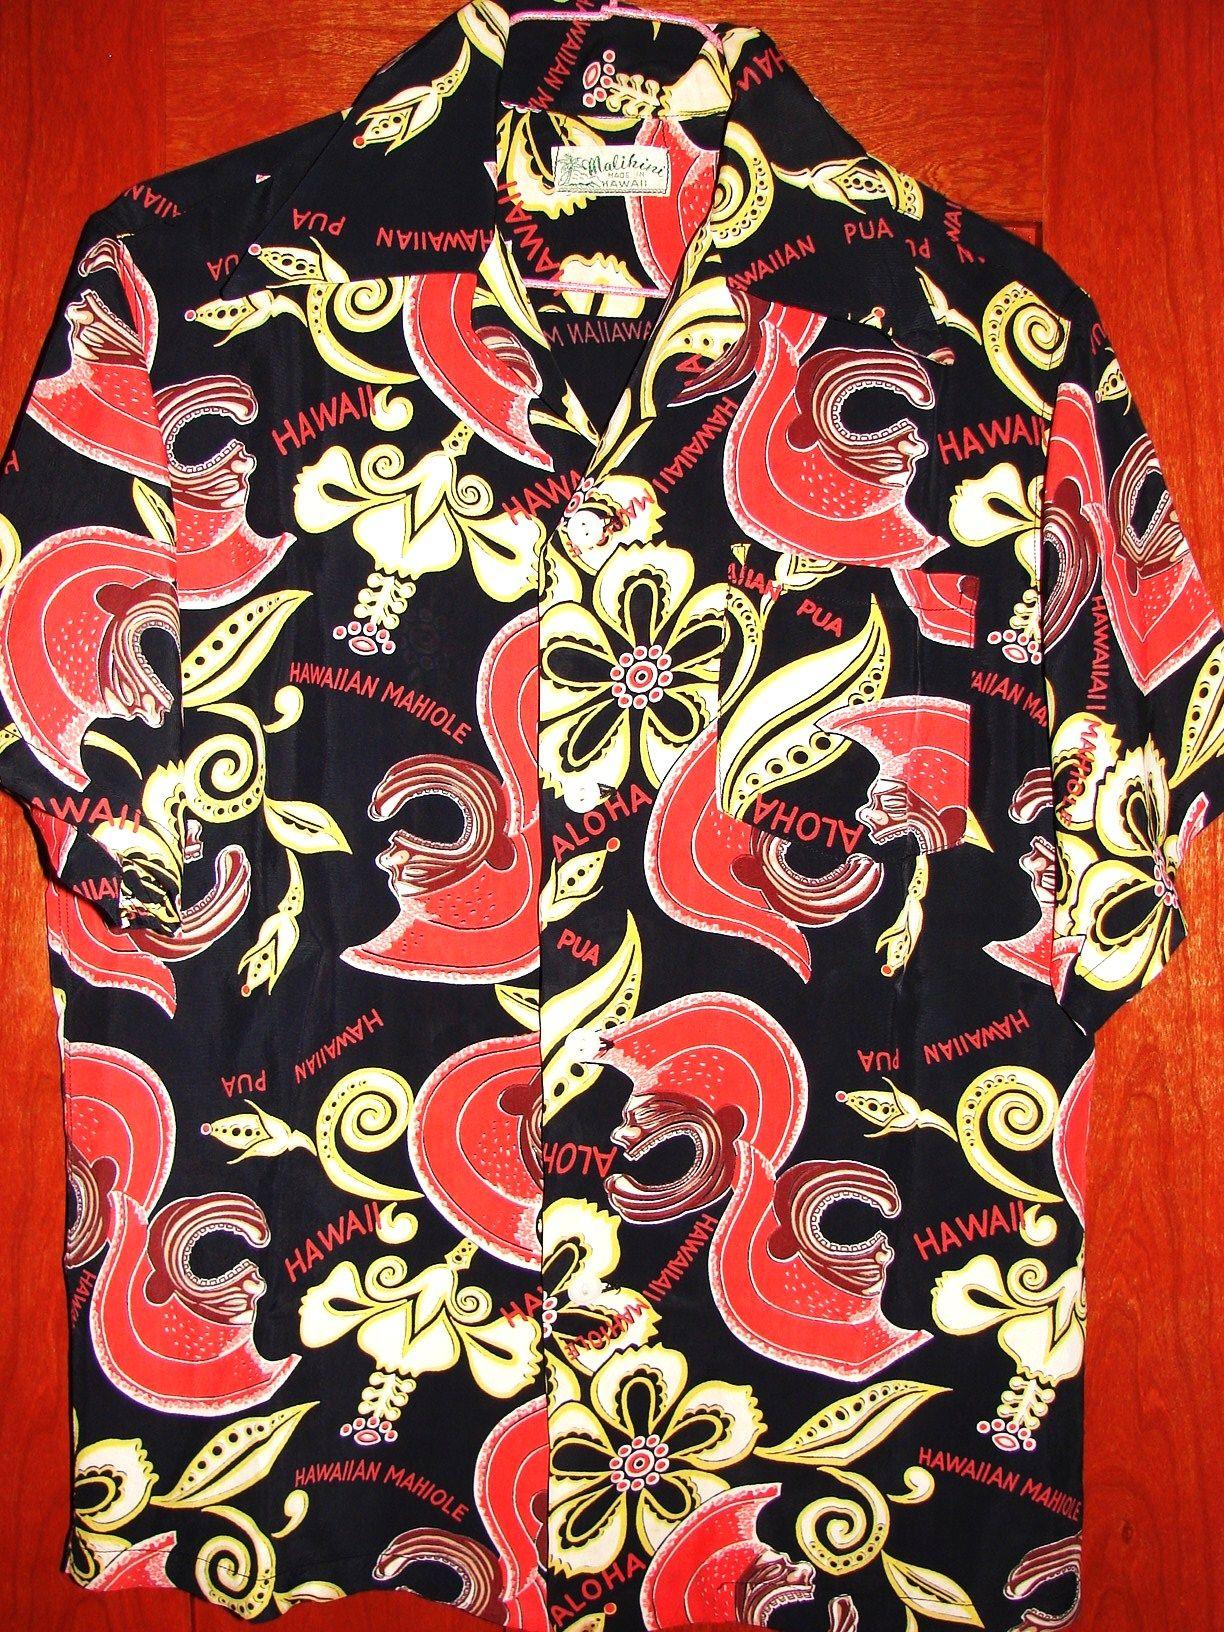 f41edda5 Malihini - 40s Rayon Vintage Aloha Shirt - TheHanaShirtCo | Fresh ...